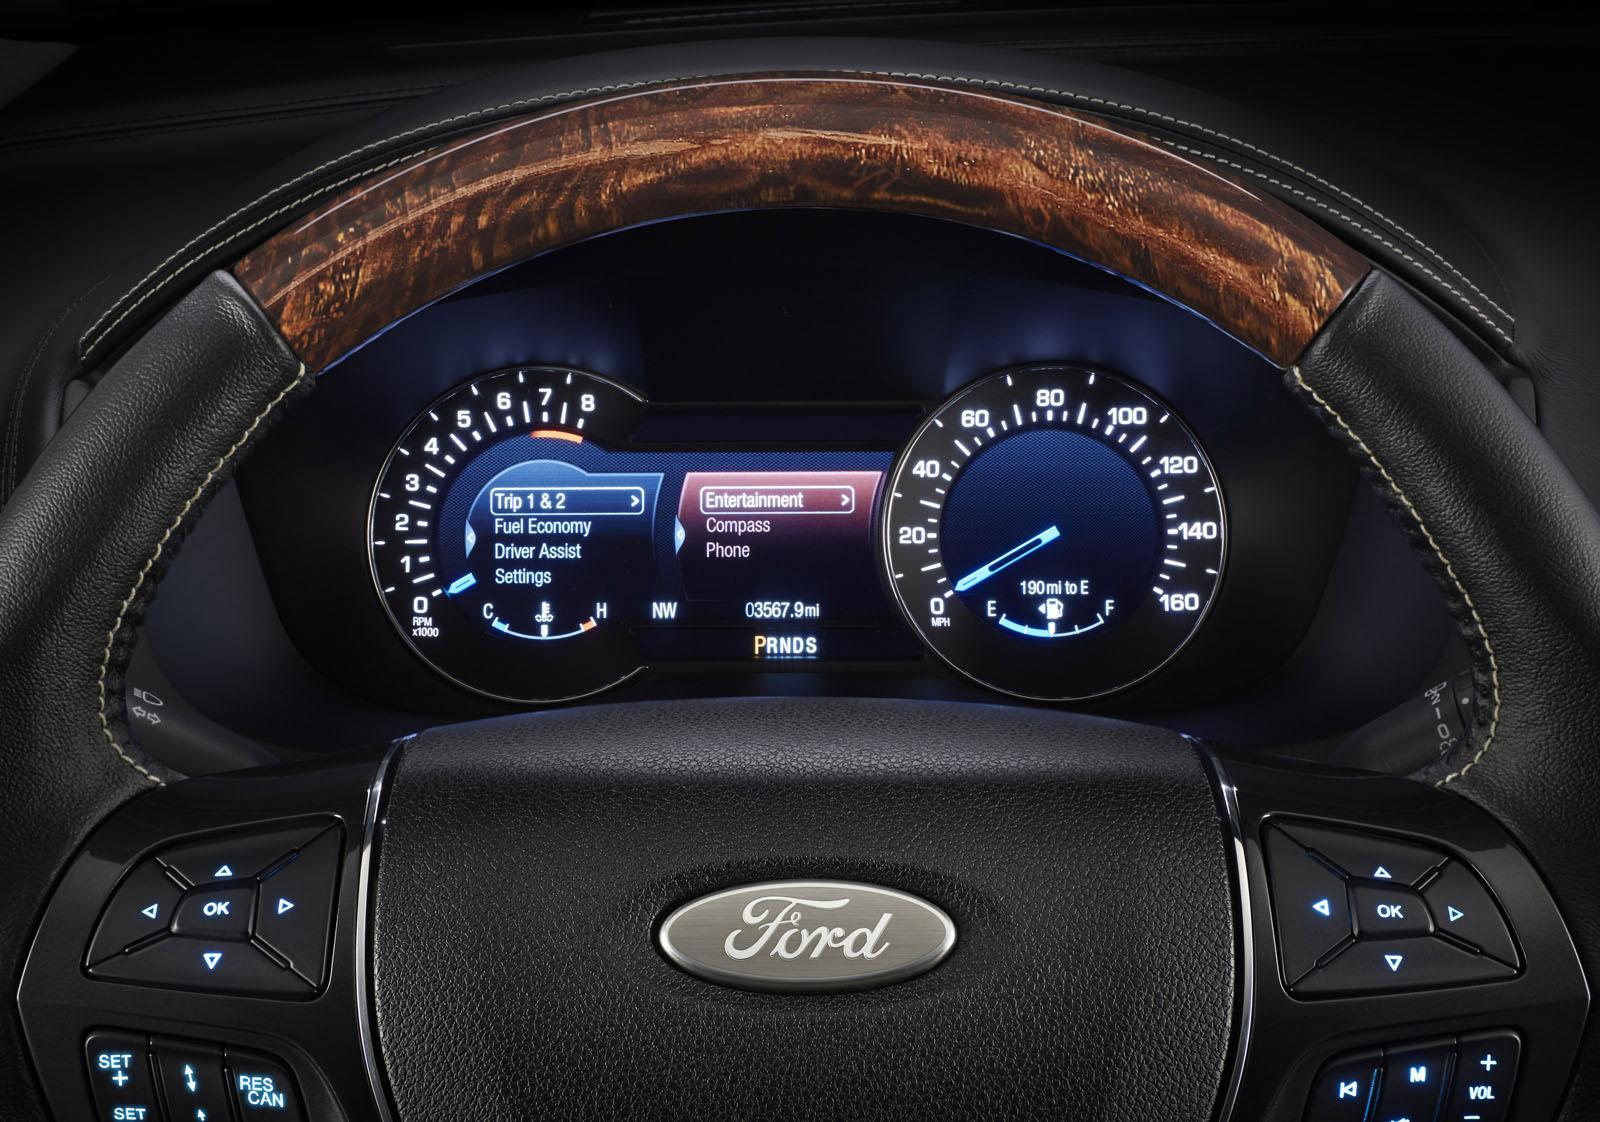 2014 Ford Explorer Xlt >> 2016 Ford Explorer Shows 2.3-liter Ecoboost and Platinium Trim Level [Video] - autoevolution